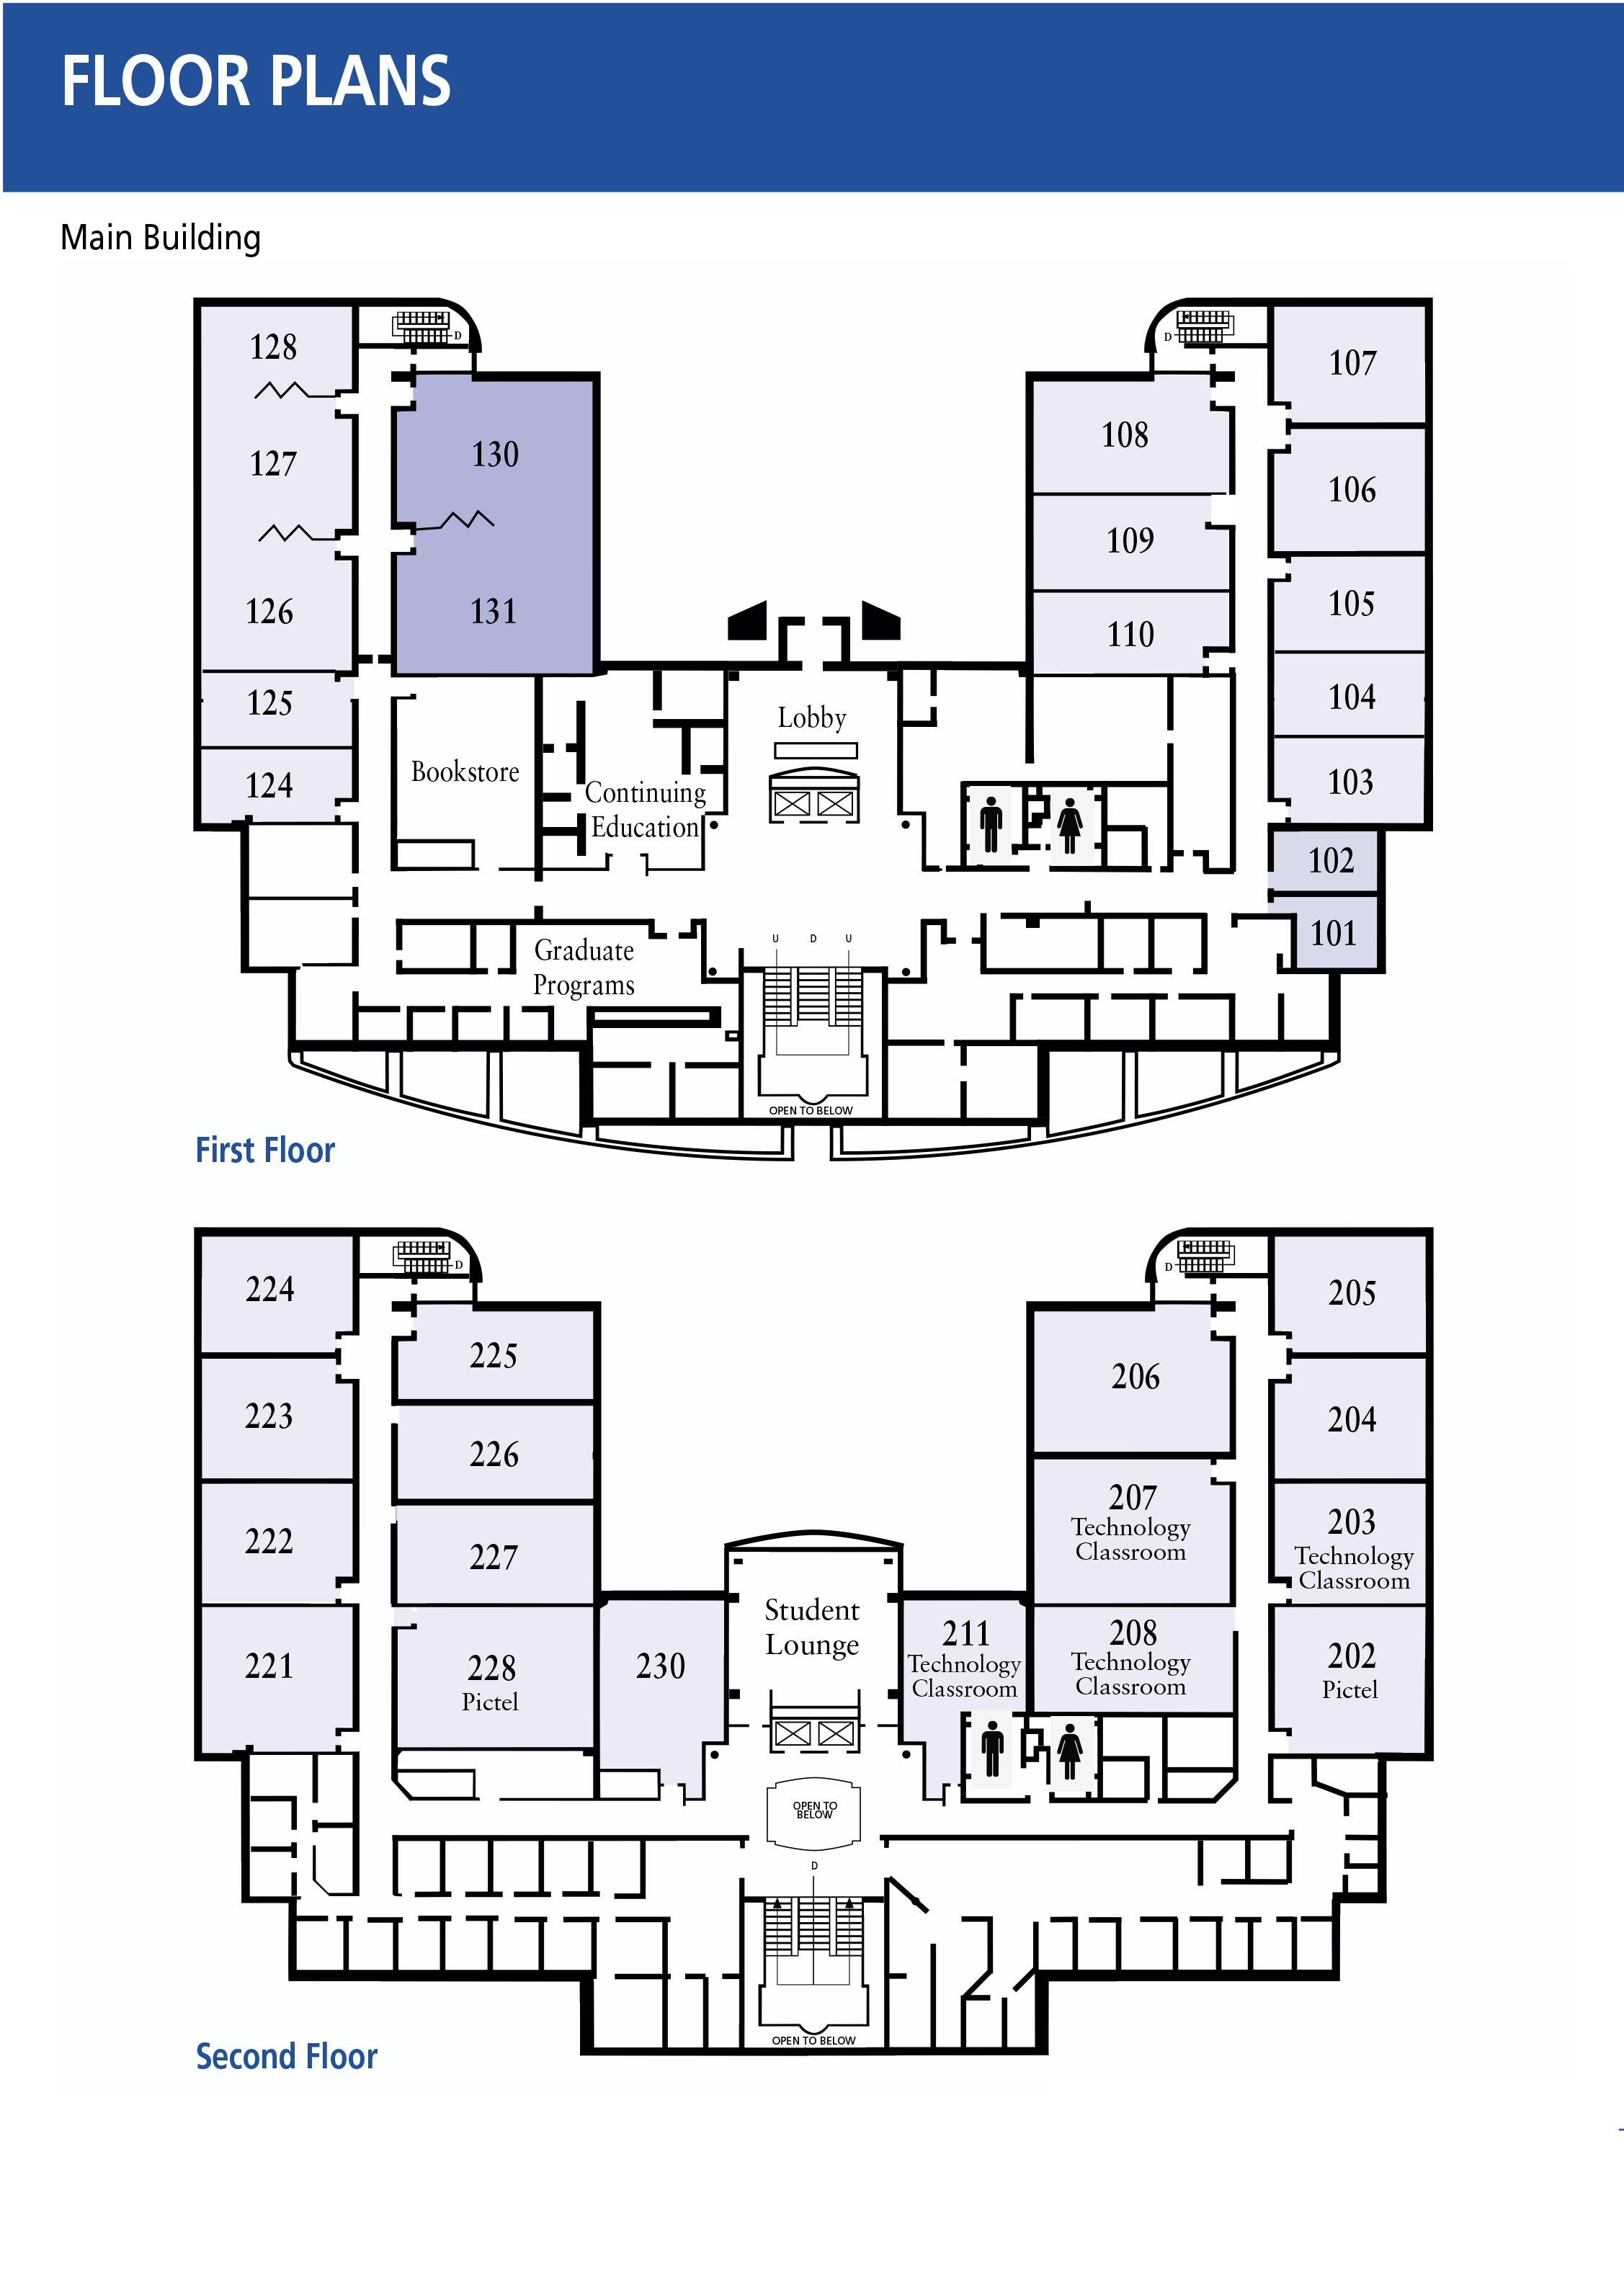 Floor Plans | Penn State Great Valley